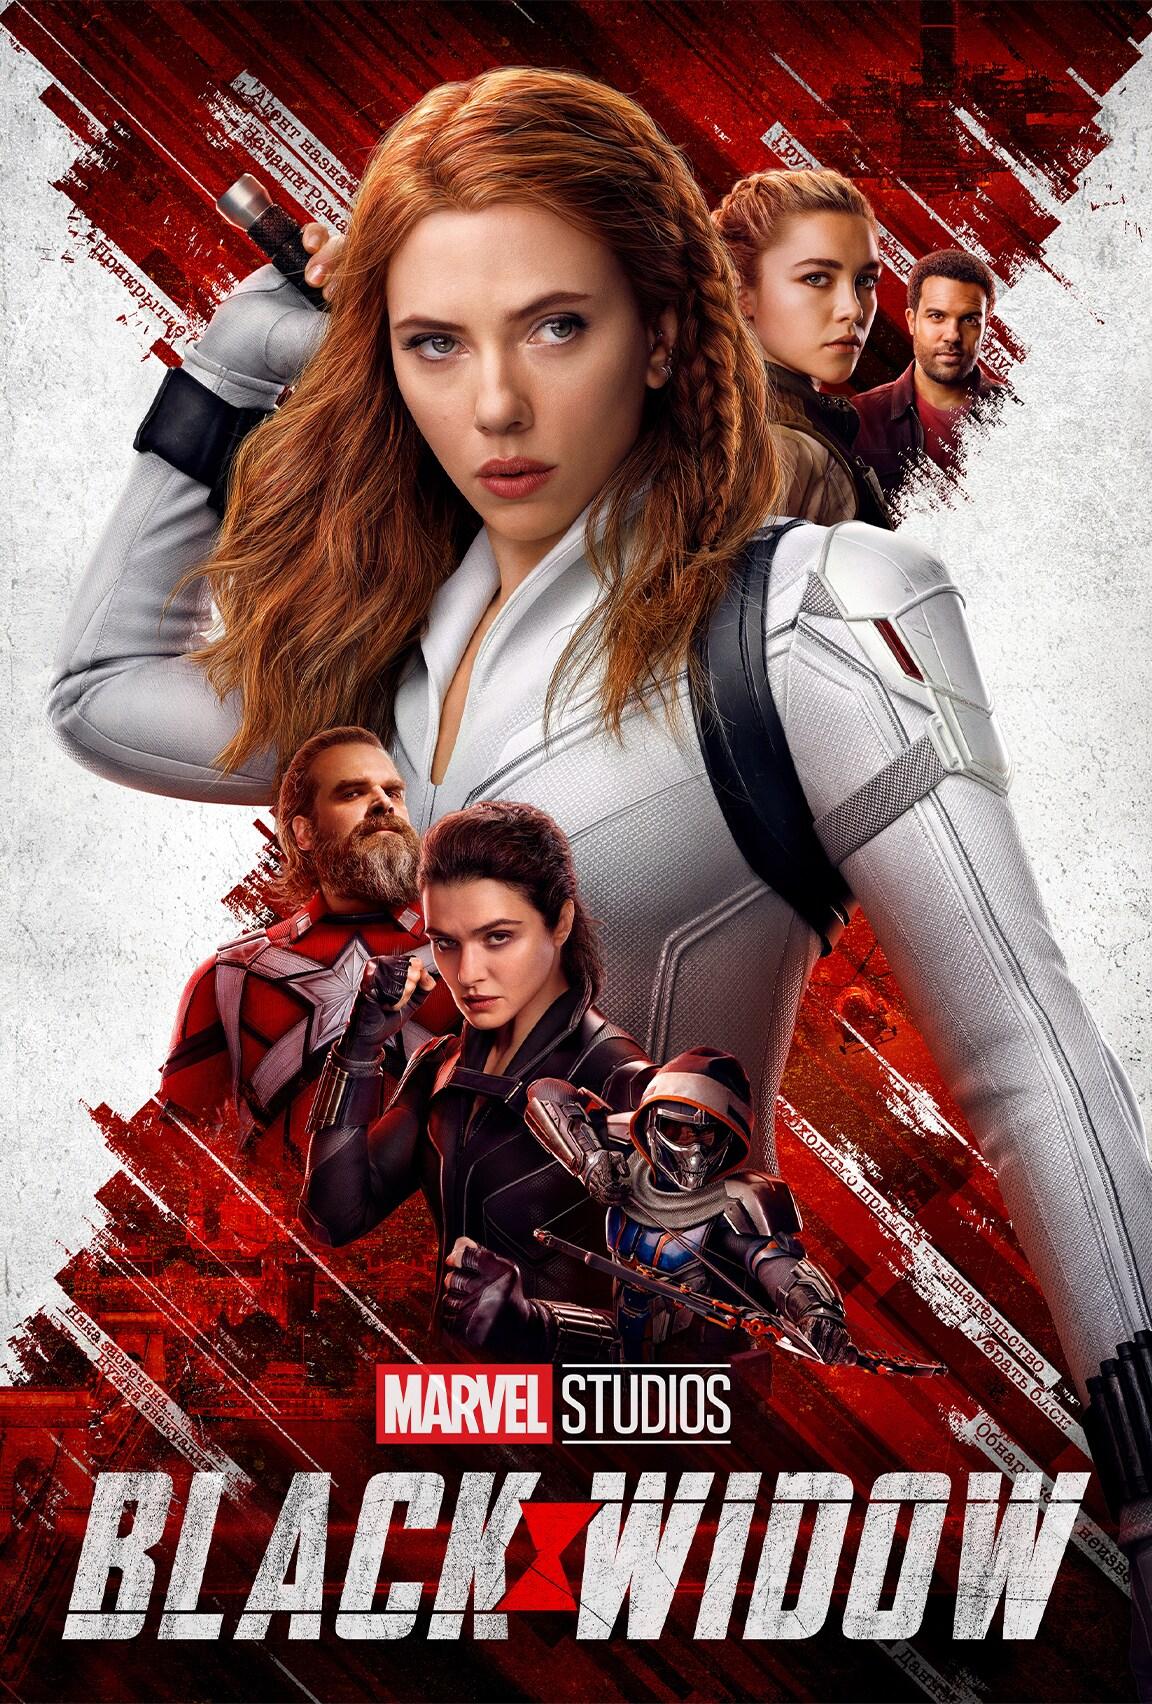 Marvel Studios' Black Widow on Disney Plus